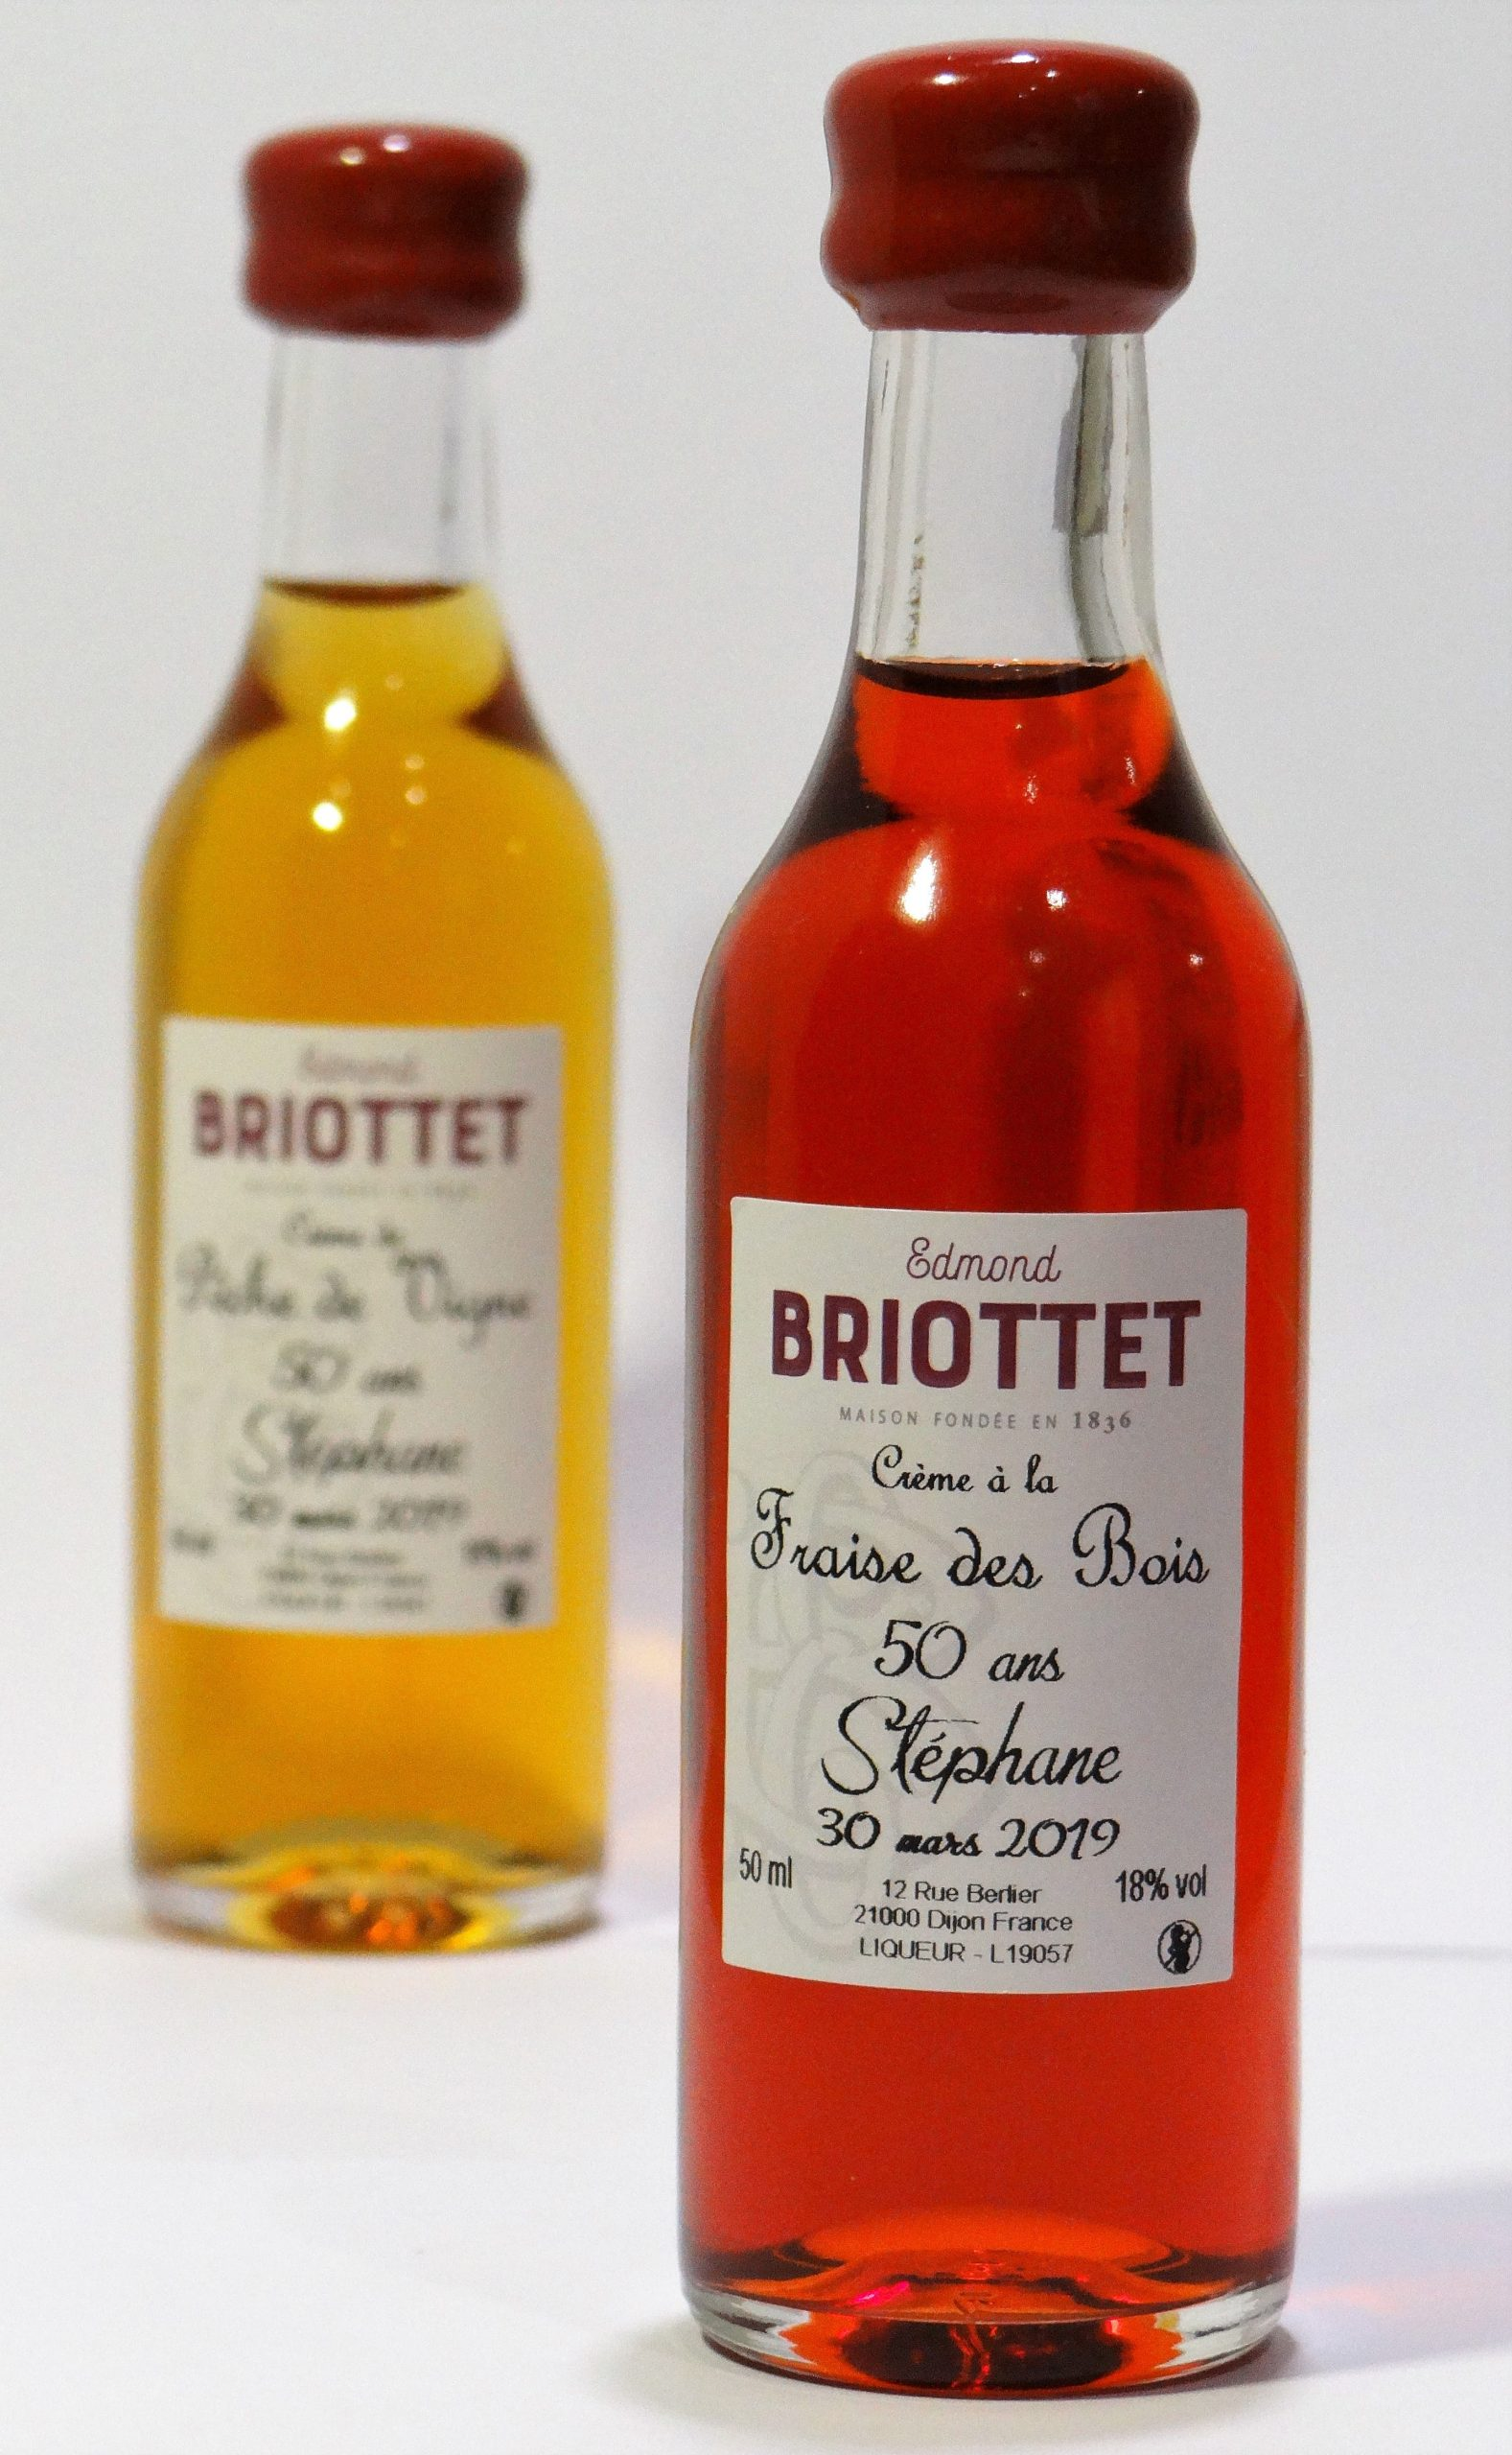 Briottet-Etiquette-personnalisee3